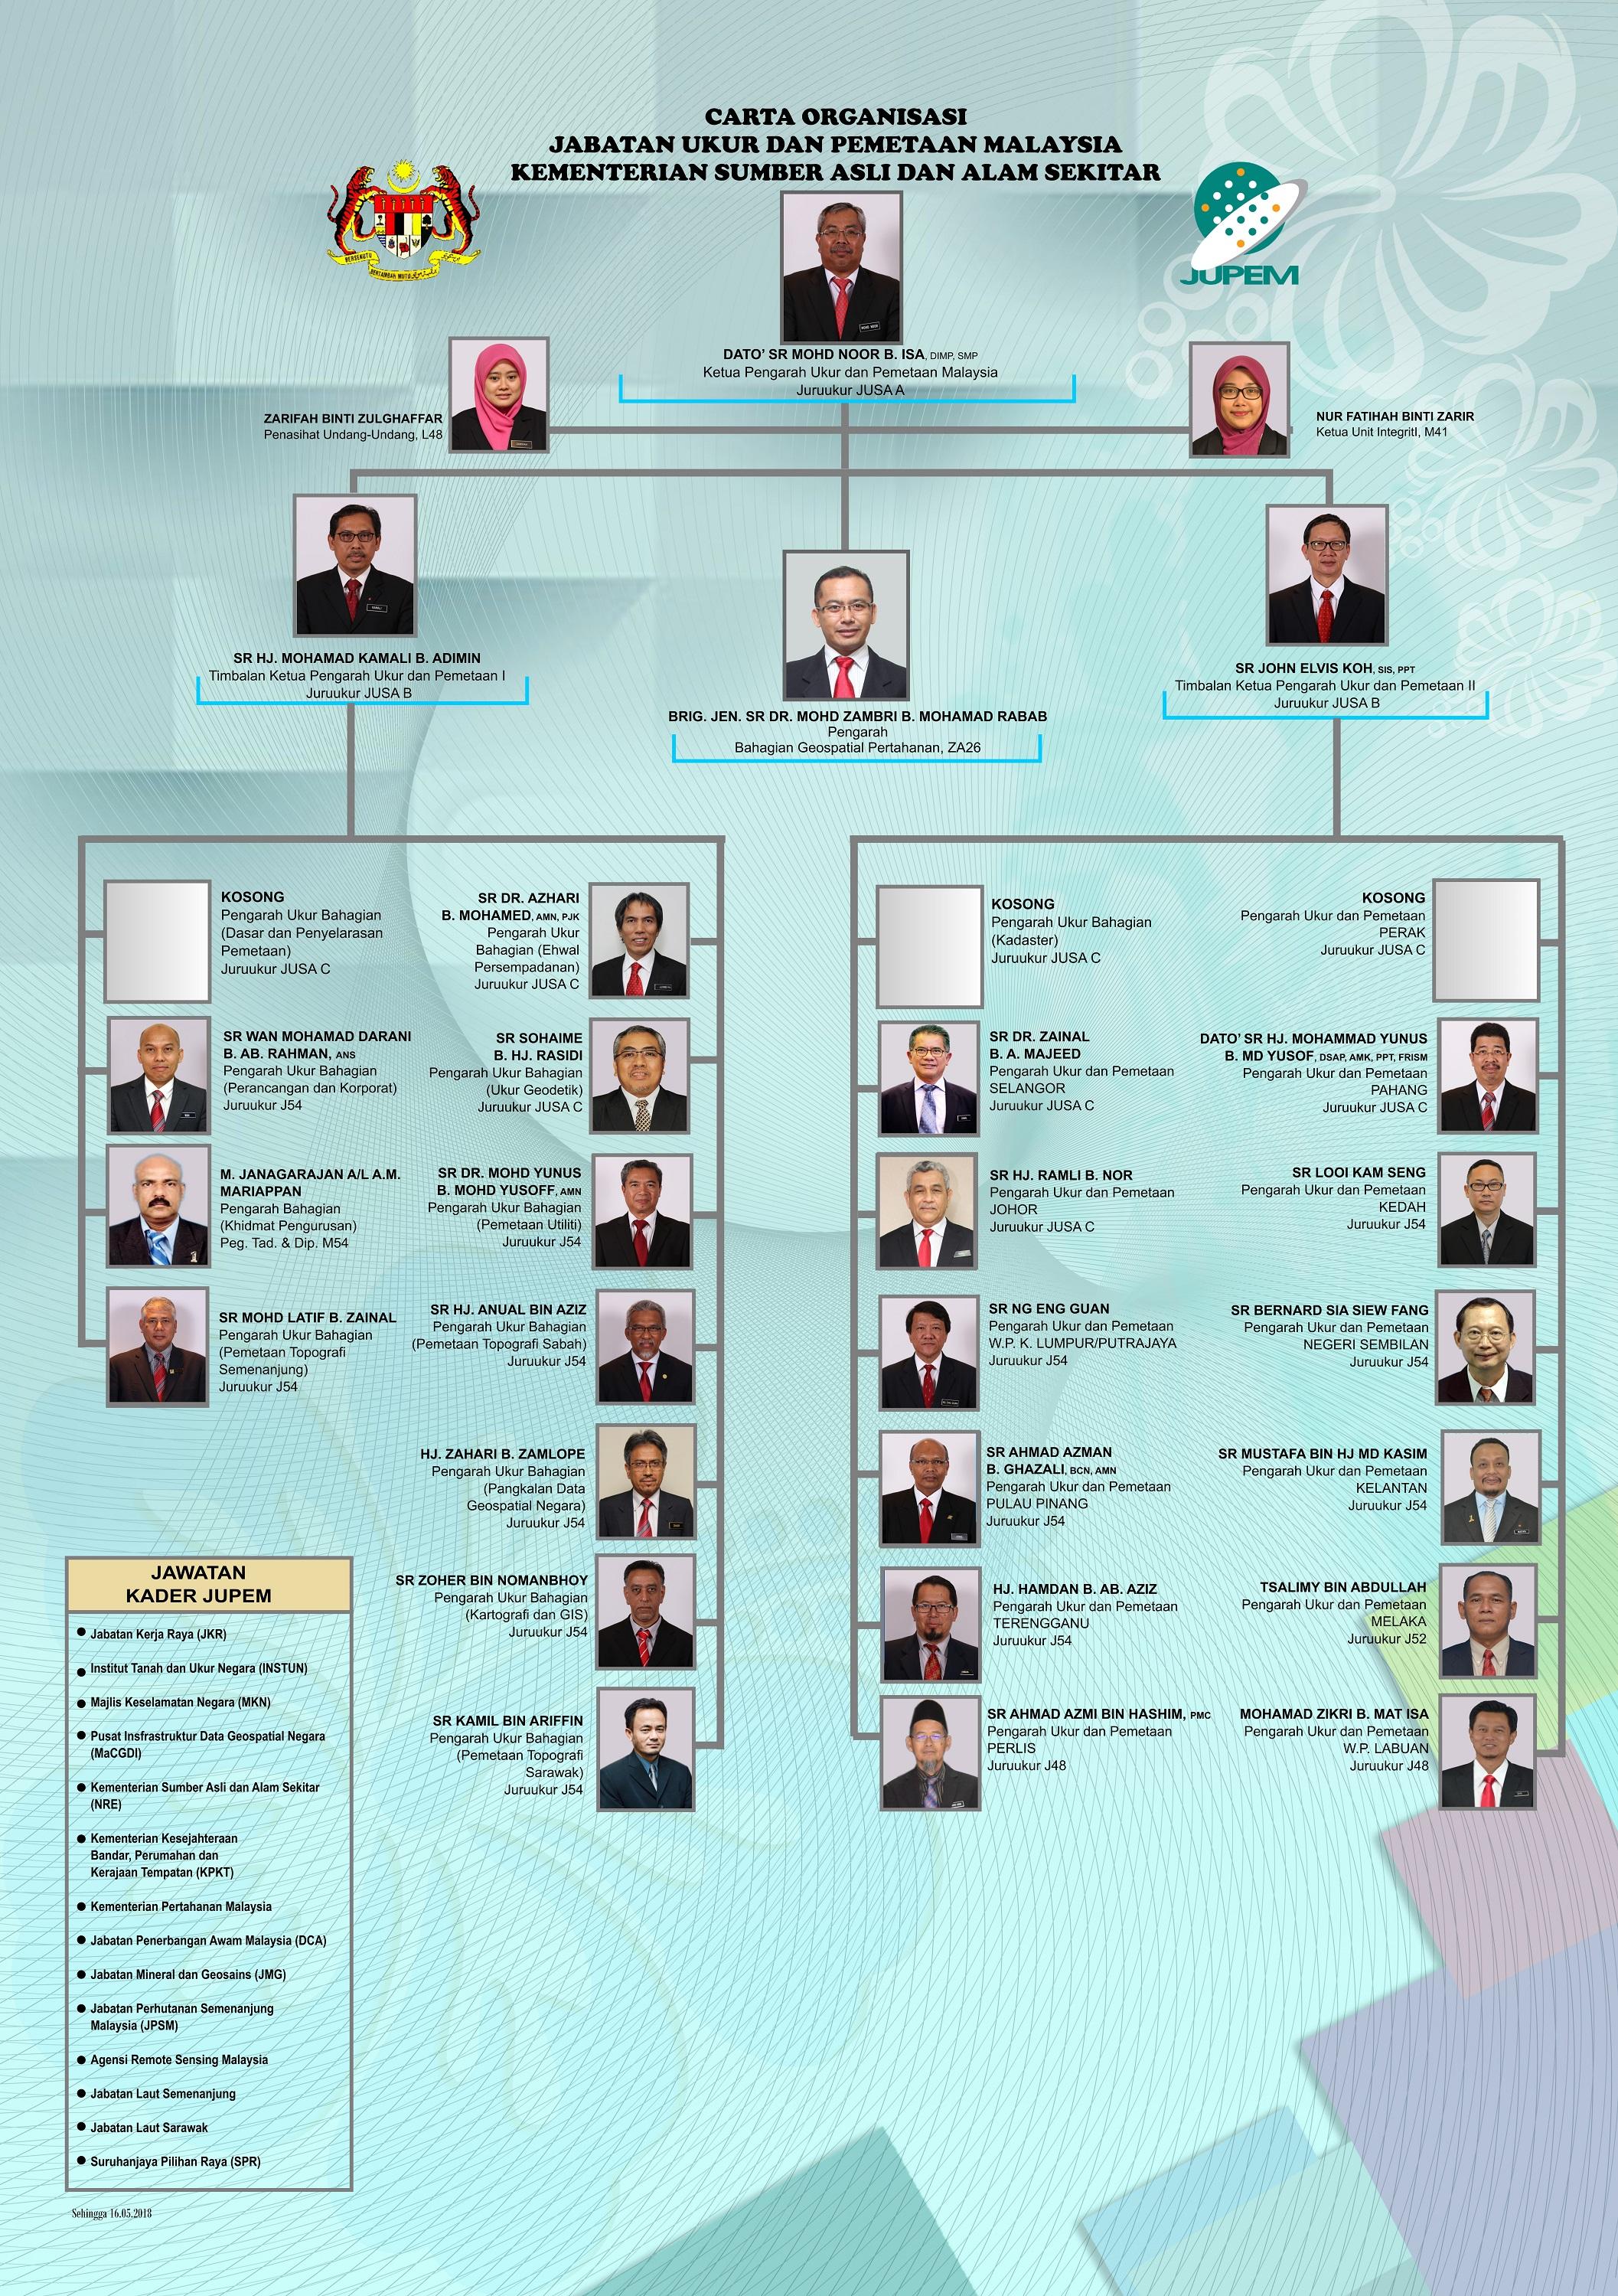 Carta_Organisasi_JUPEM_BM_15122017